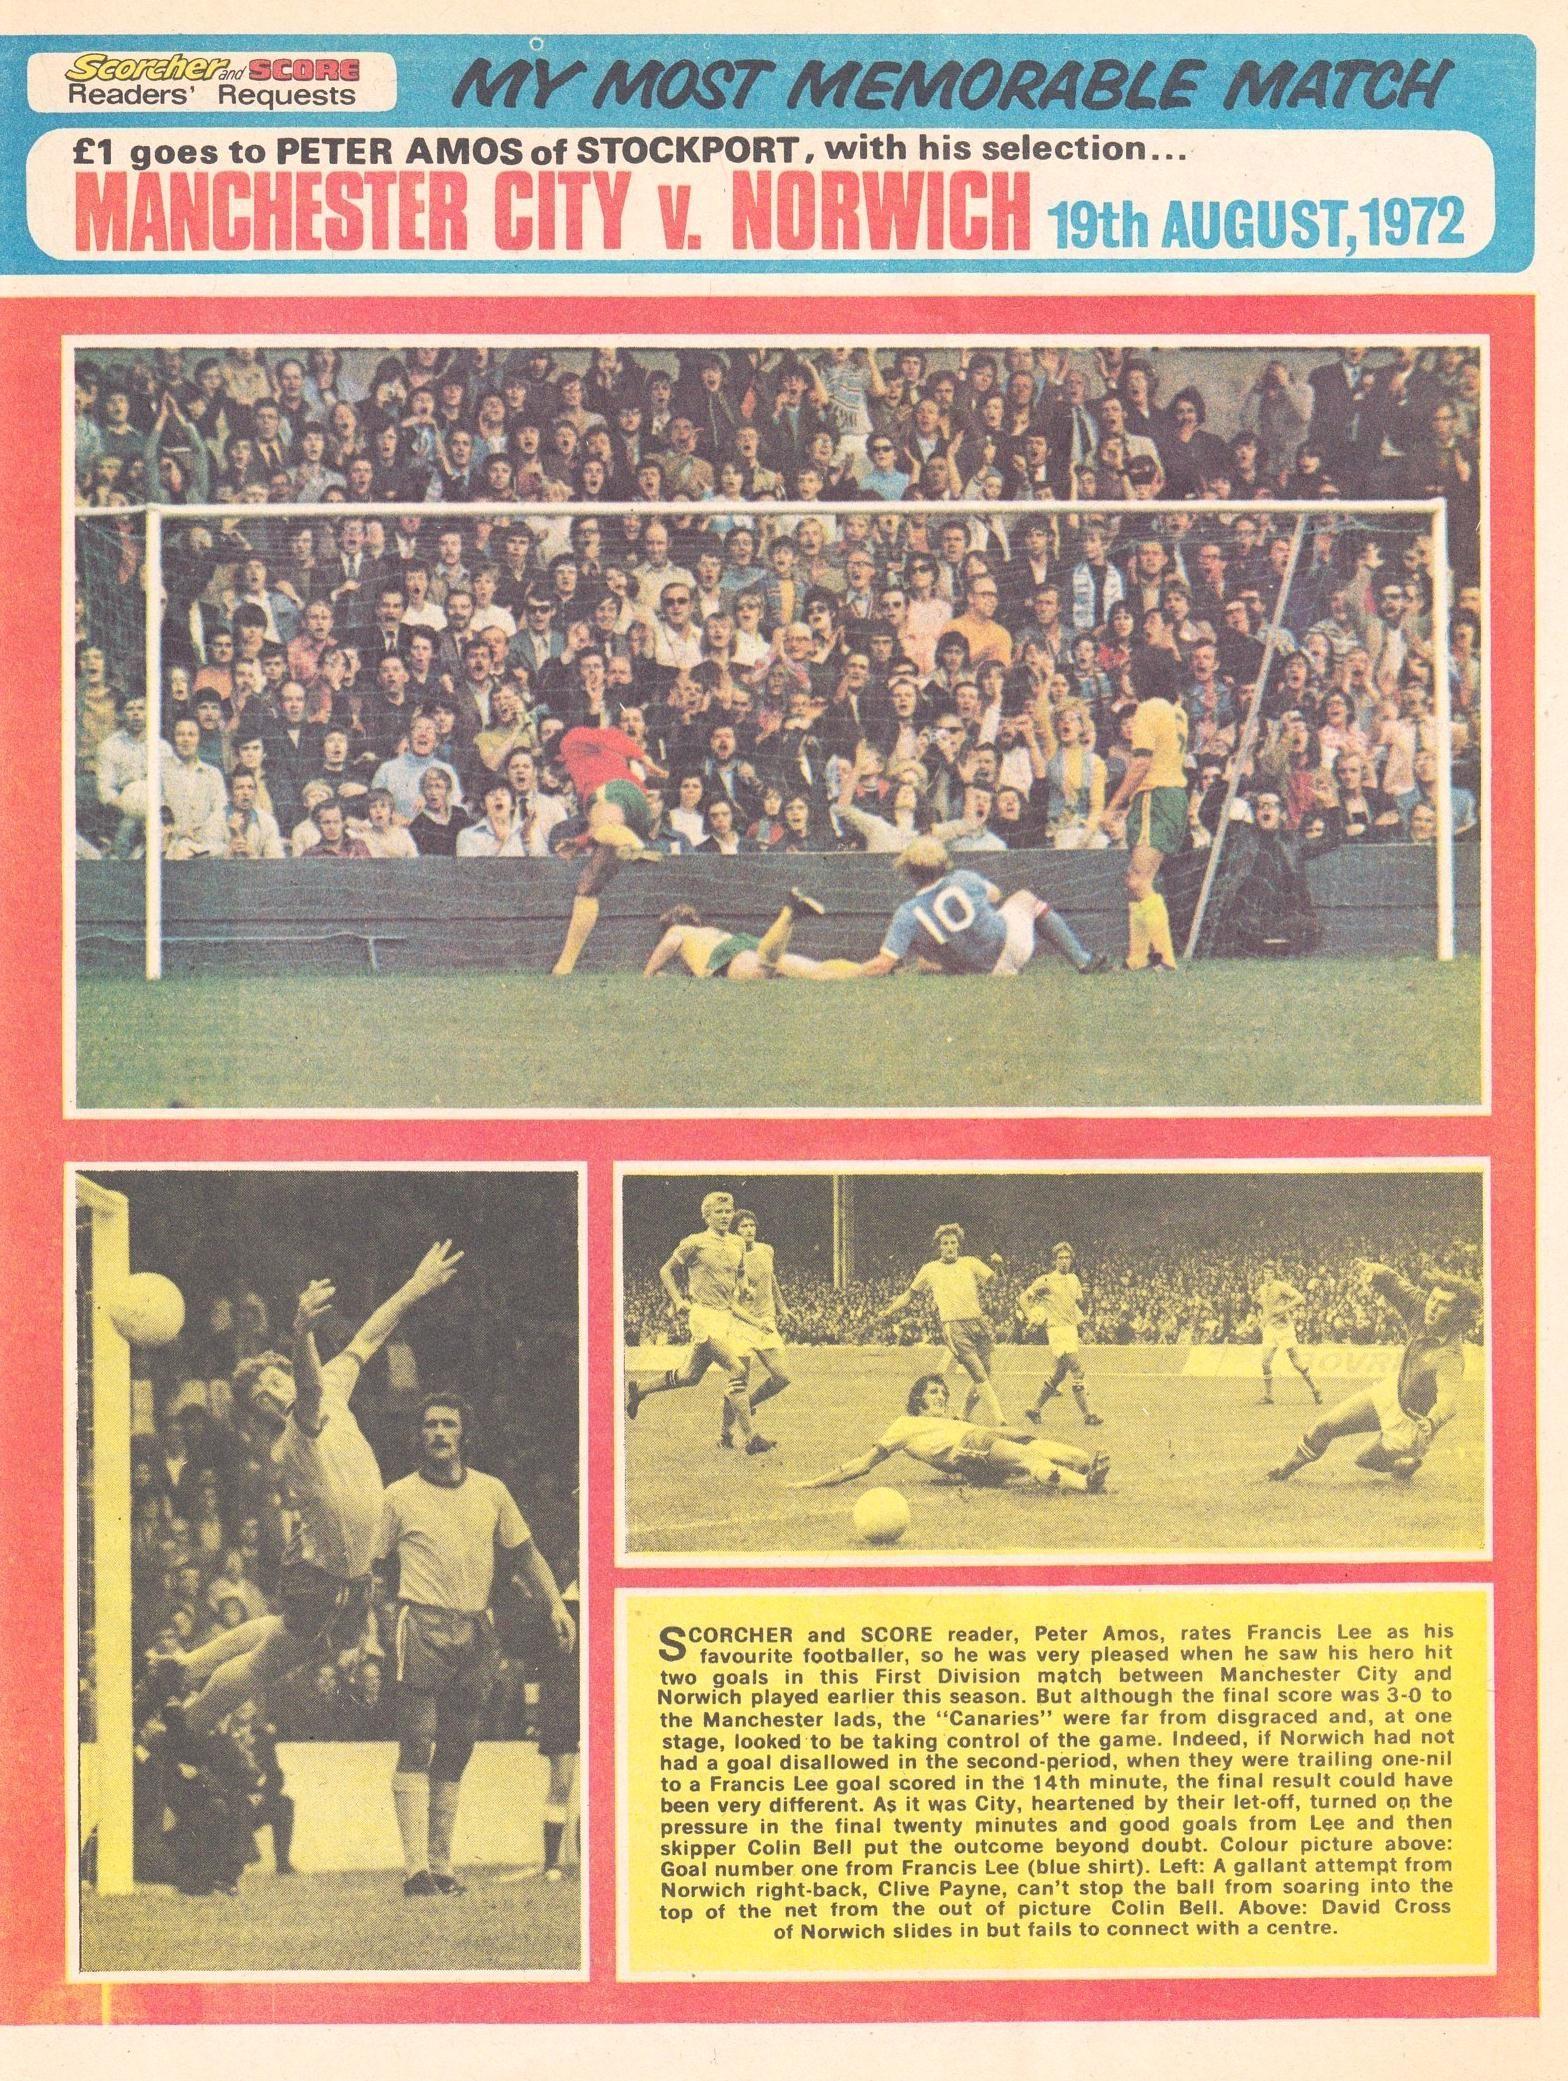 norwich home 1972 to 73 scorcher 2 dec 72